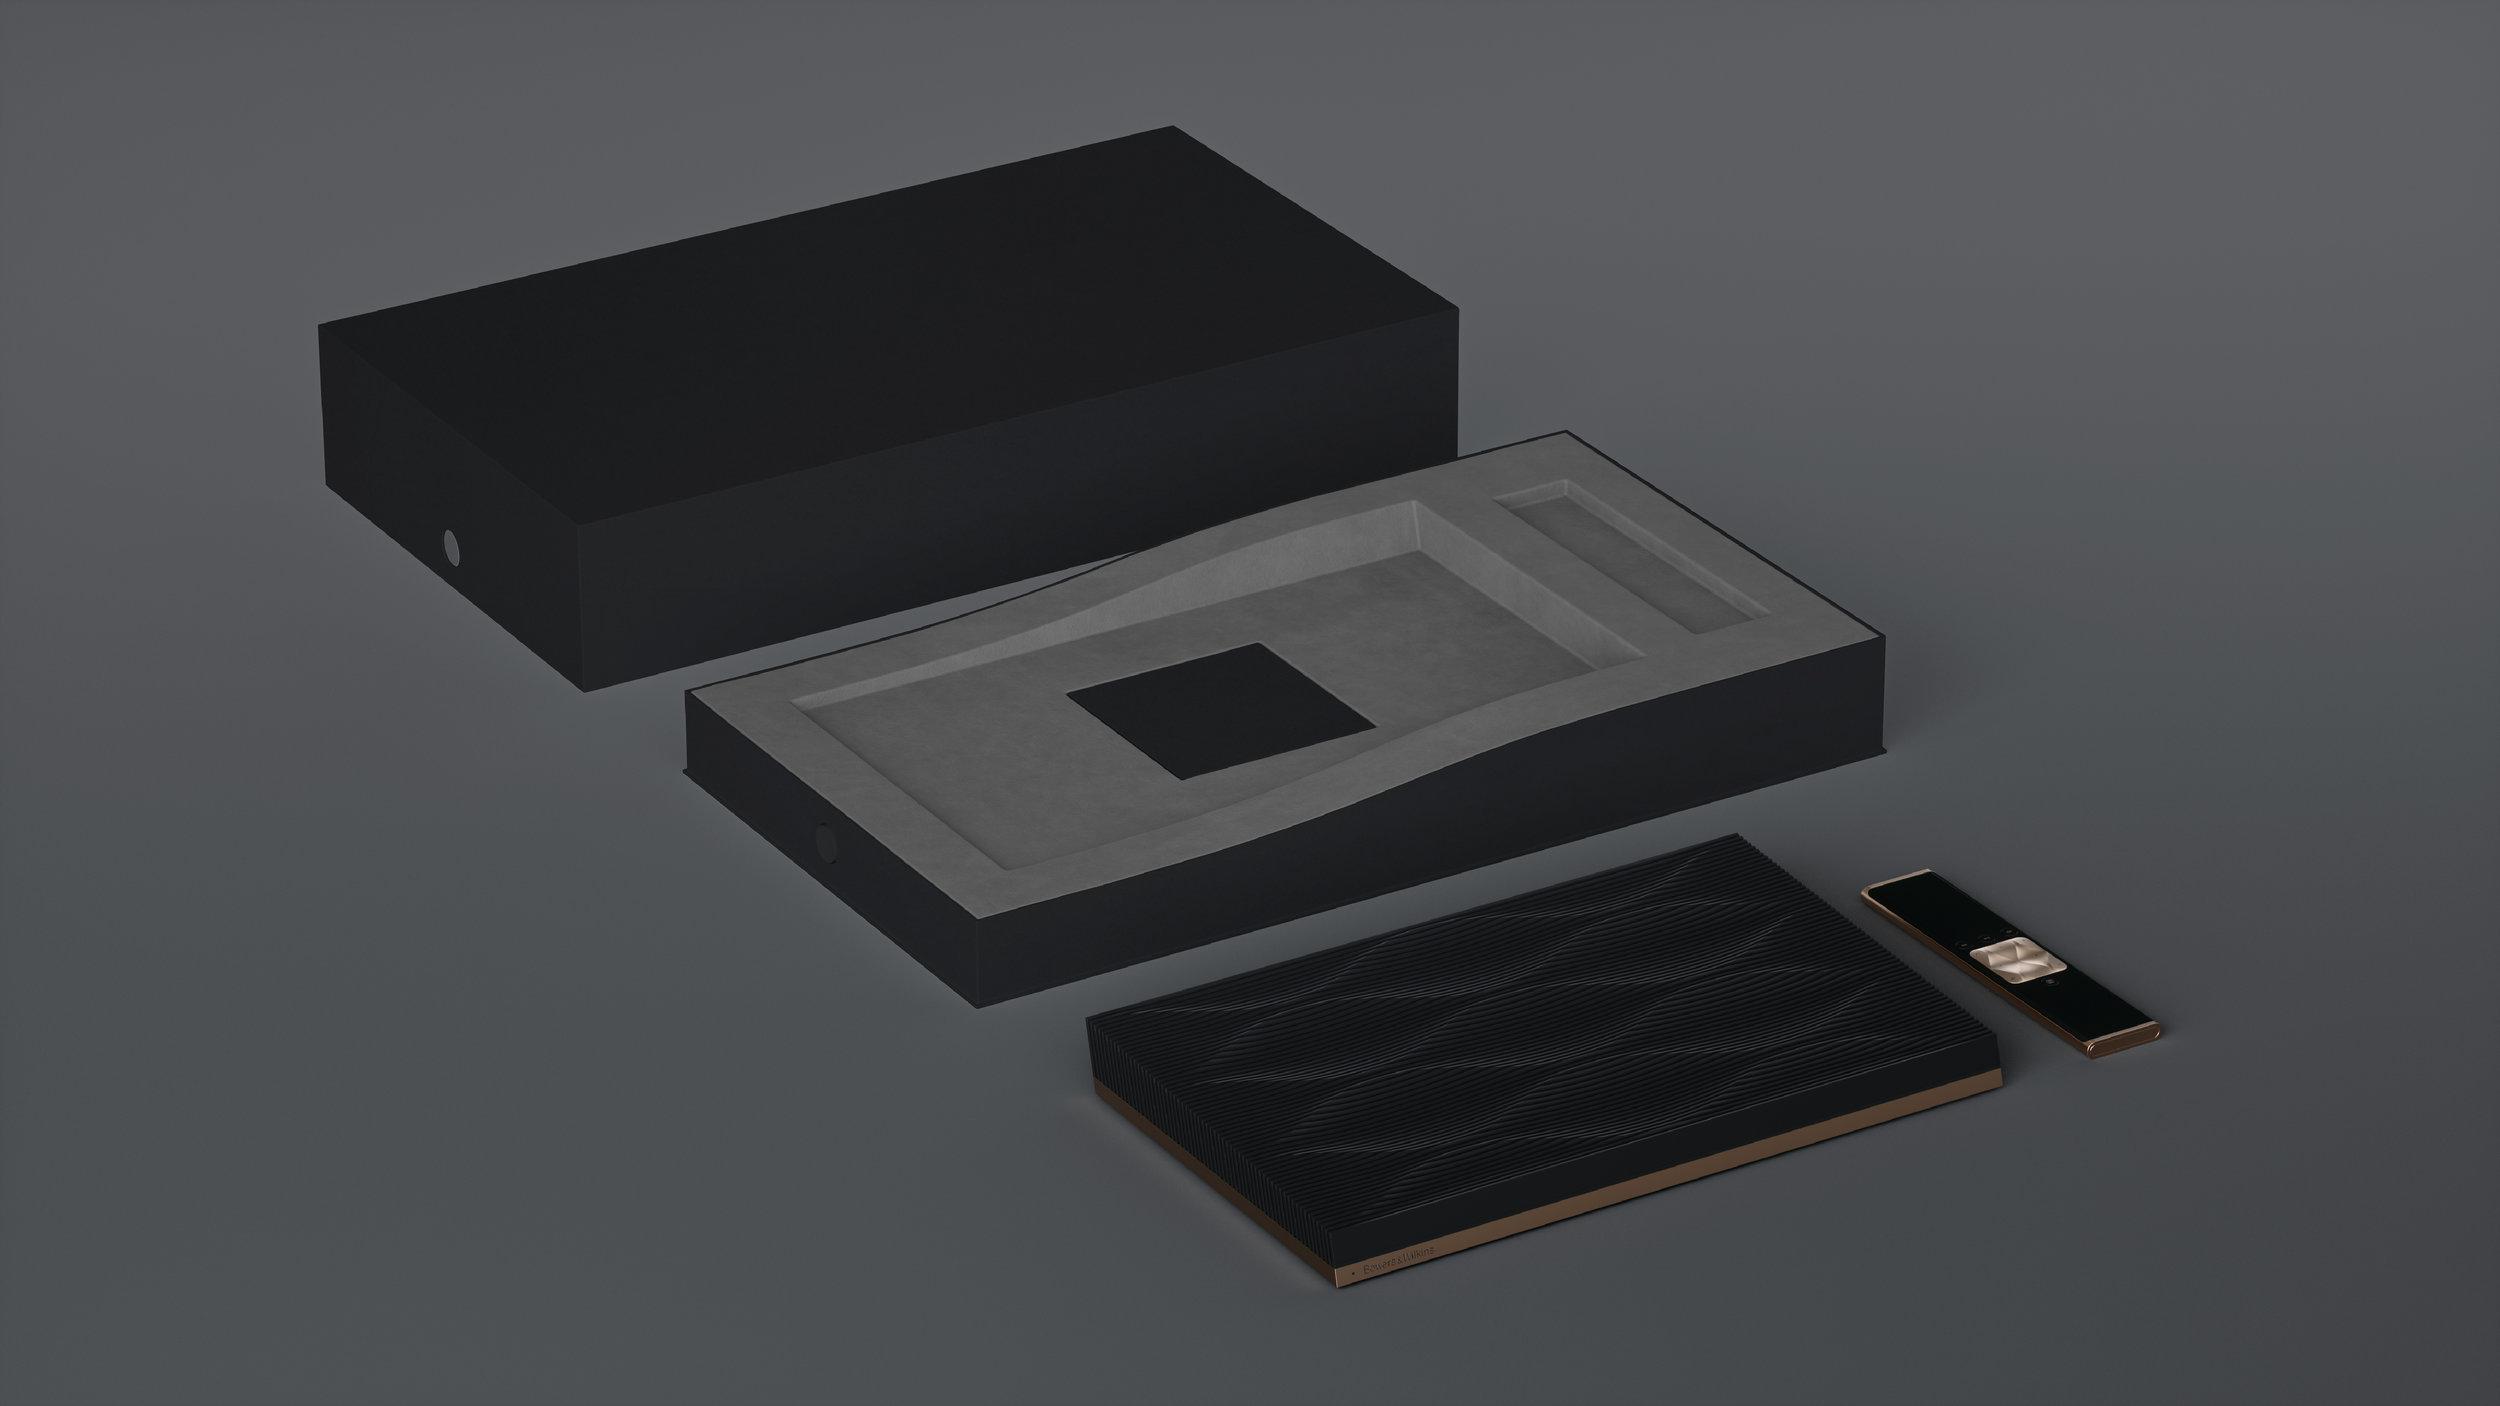 B&W_LibertySuite_PackagingStructure_R135.jpg